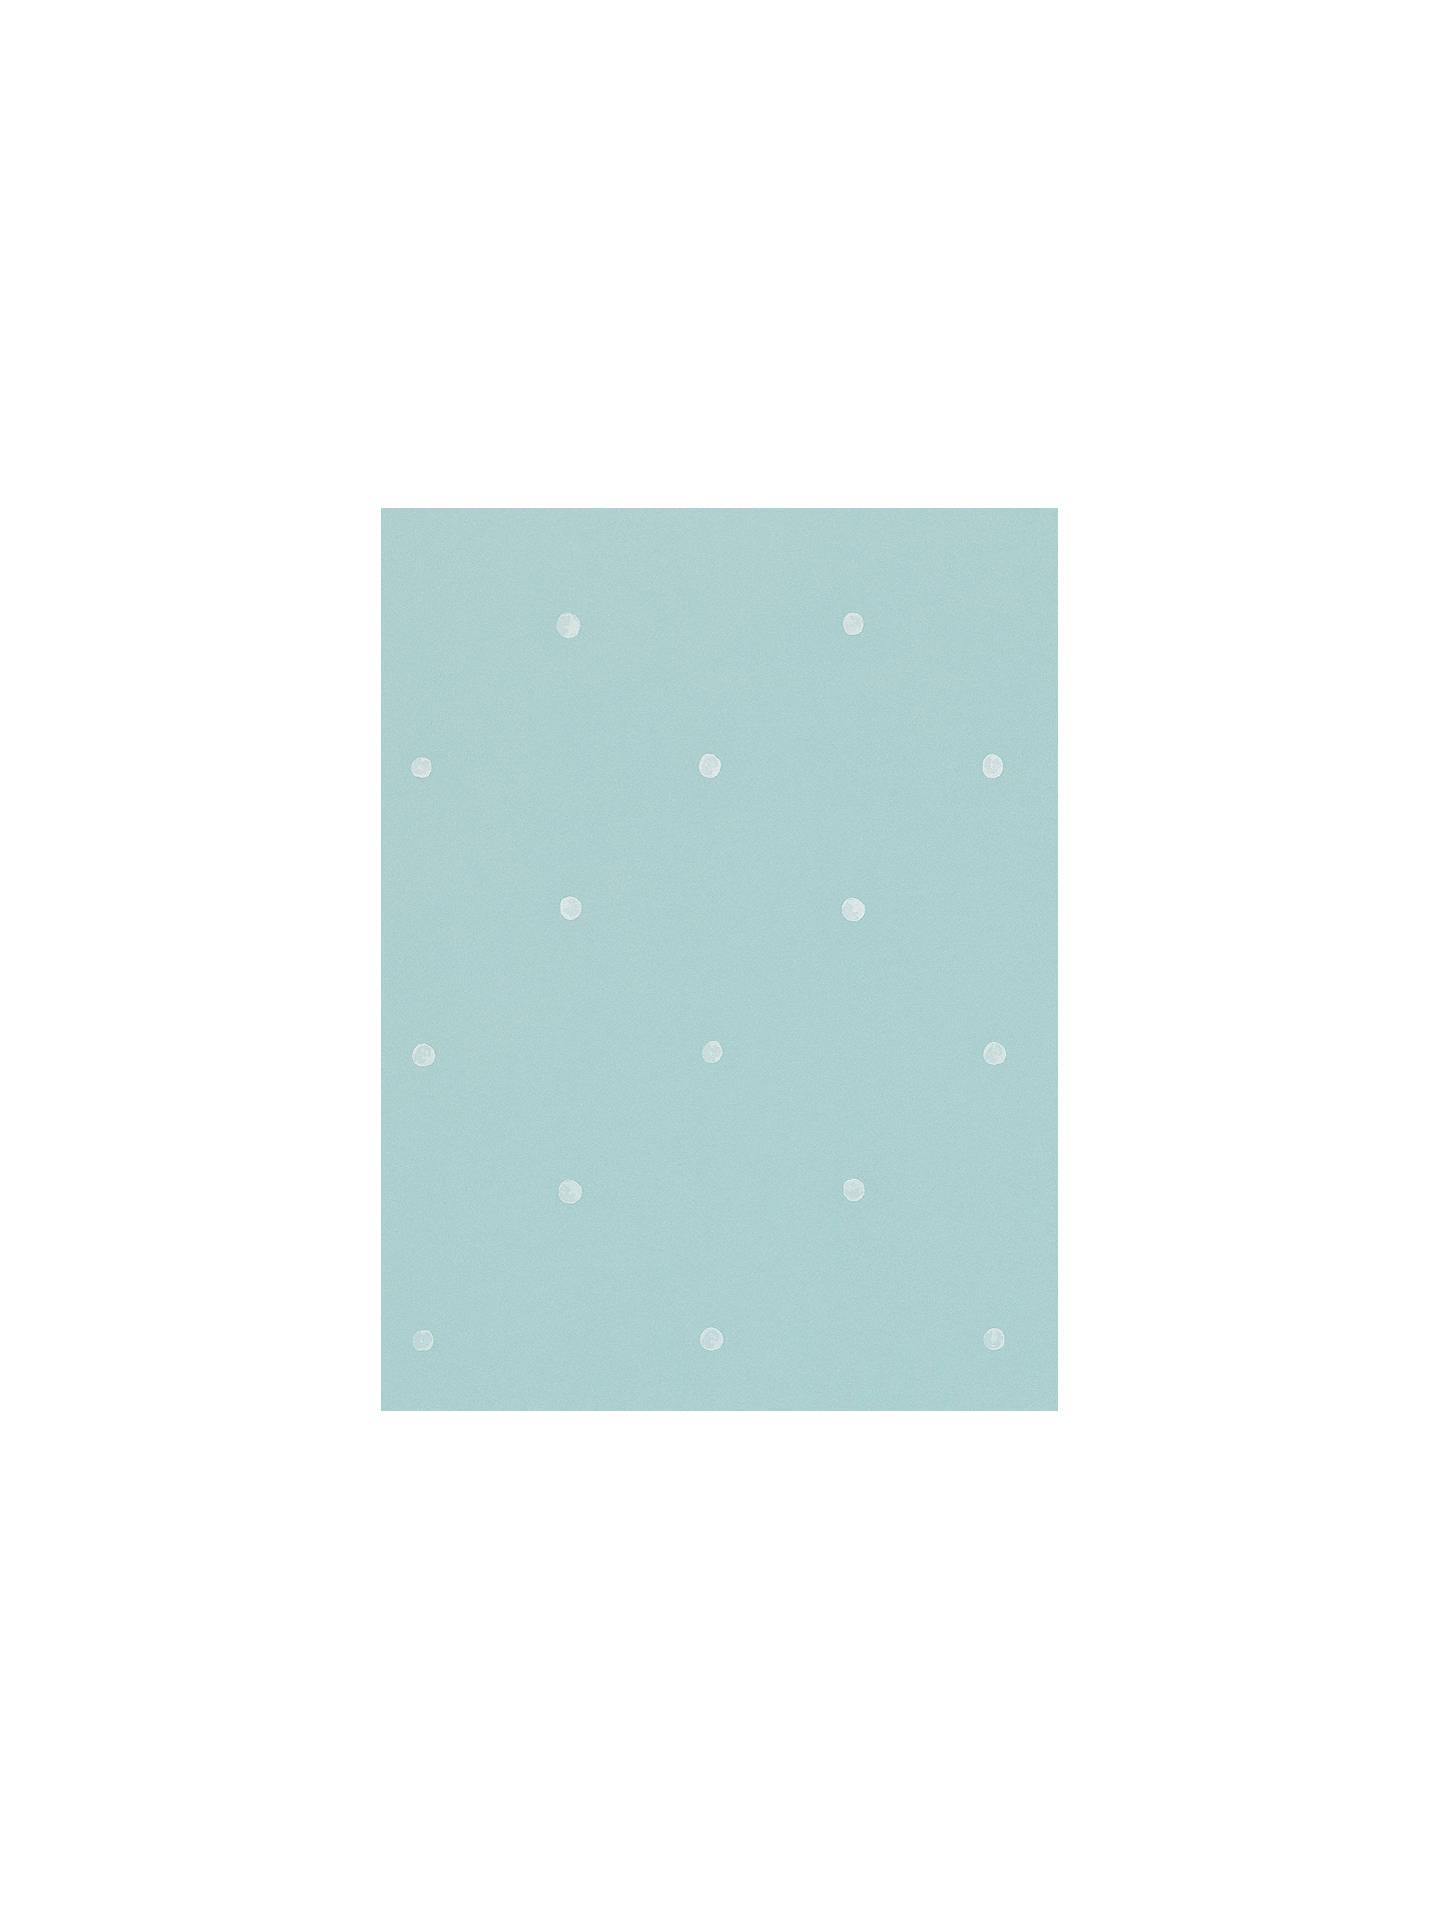 Buy Sanderson Polka Paste the Wall Wallpaper, DMAD212846 Online at johnlewis.com